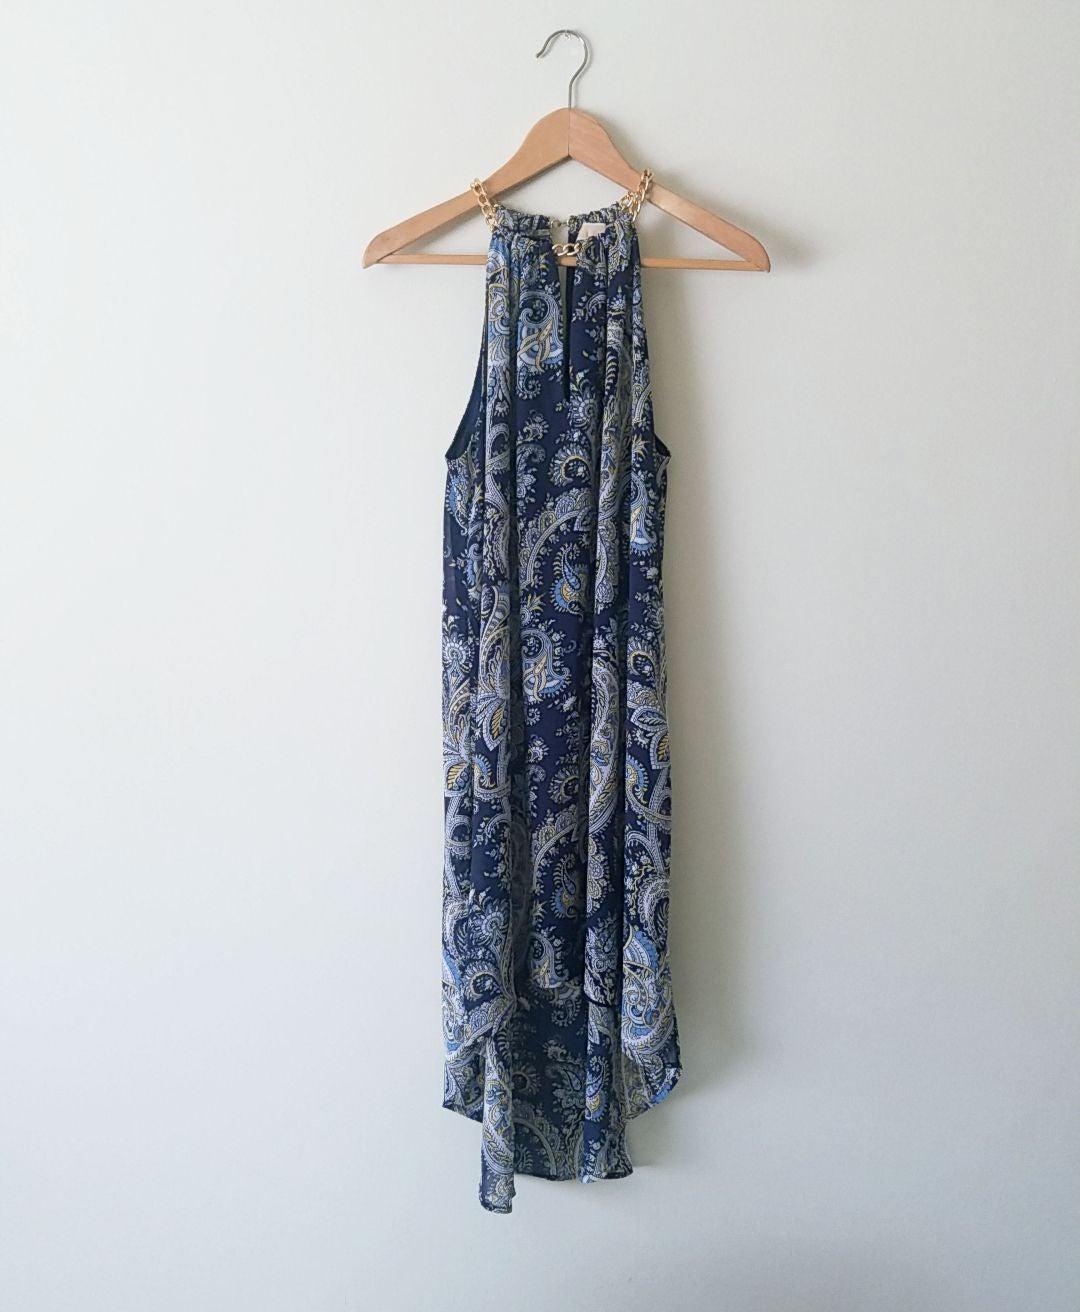 Michael Kors boho dress